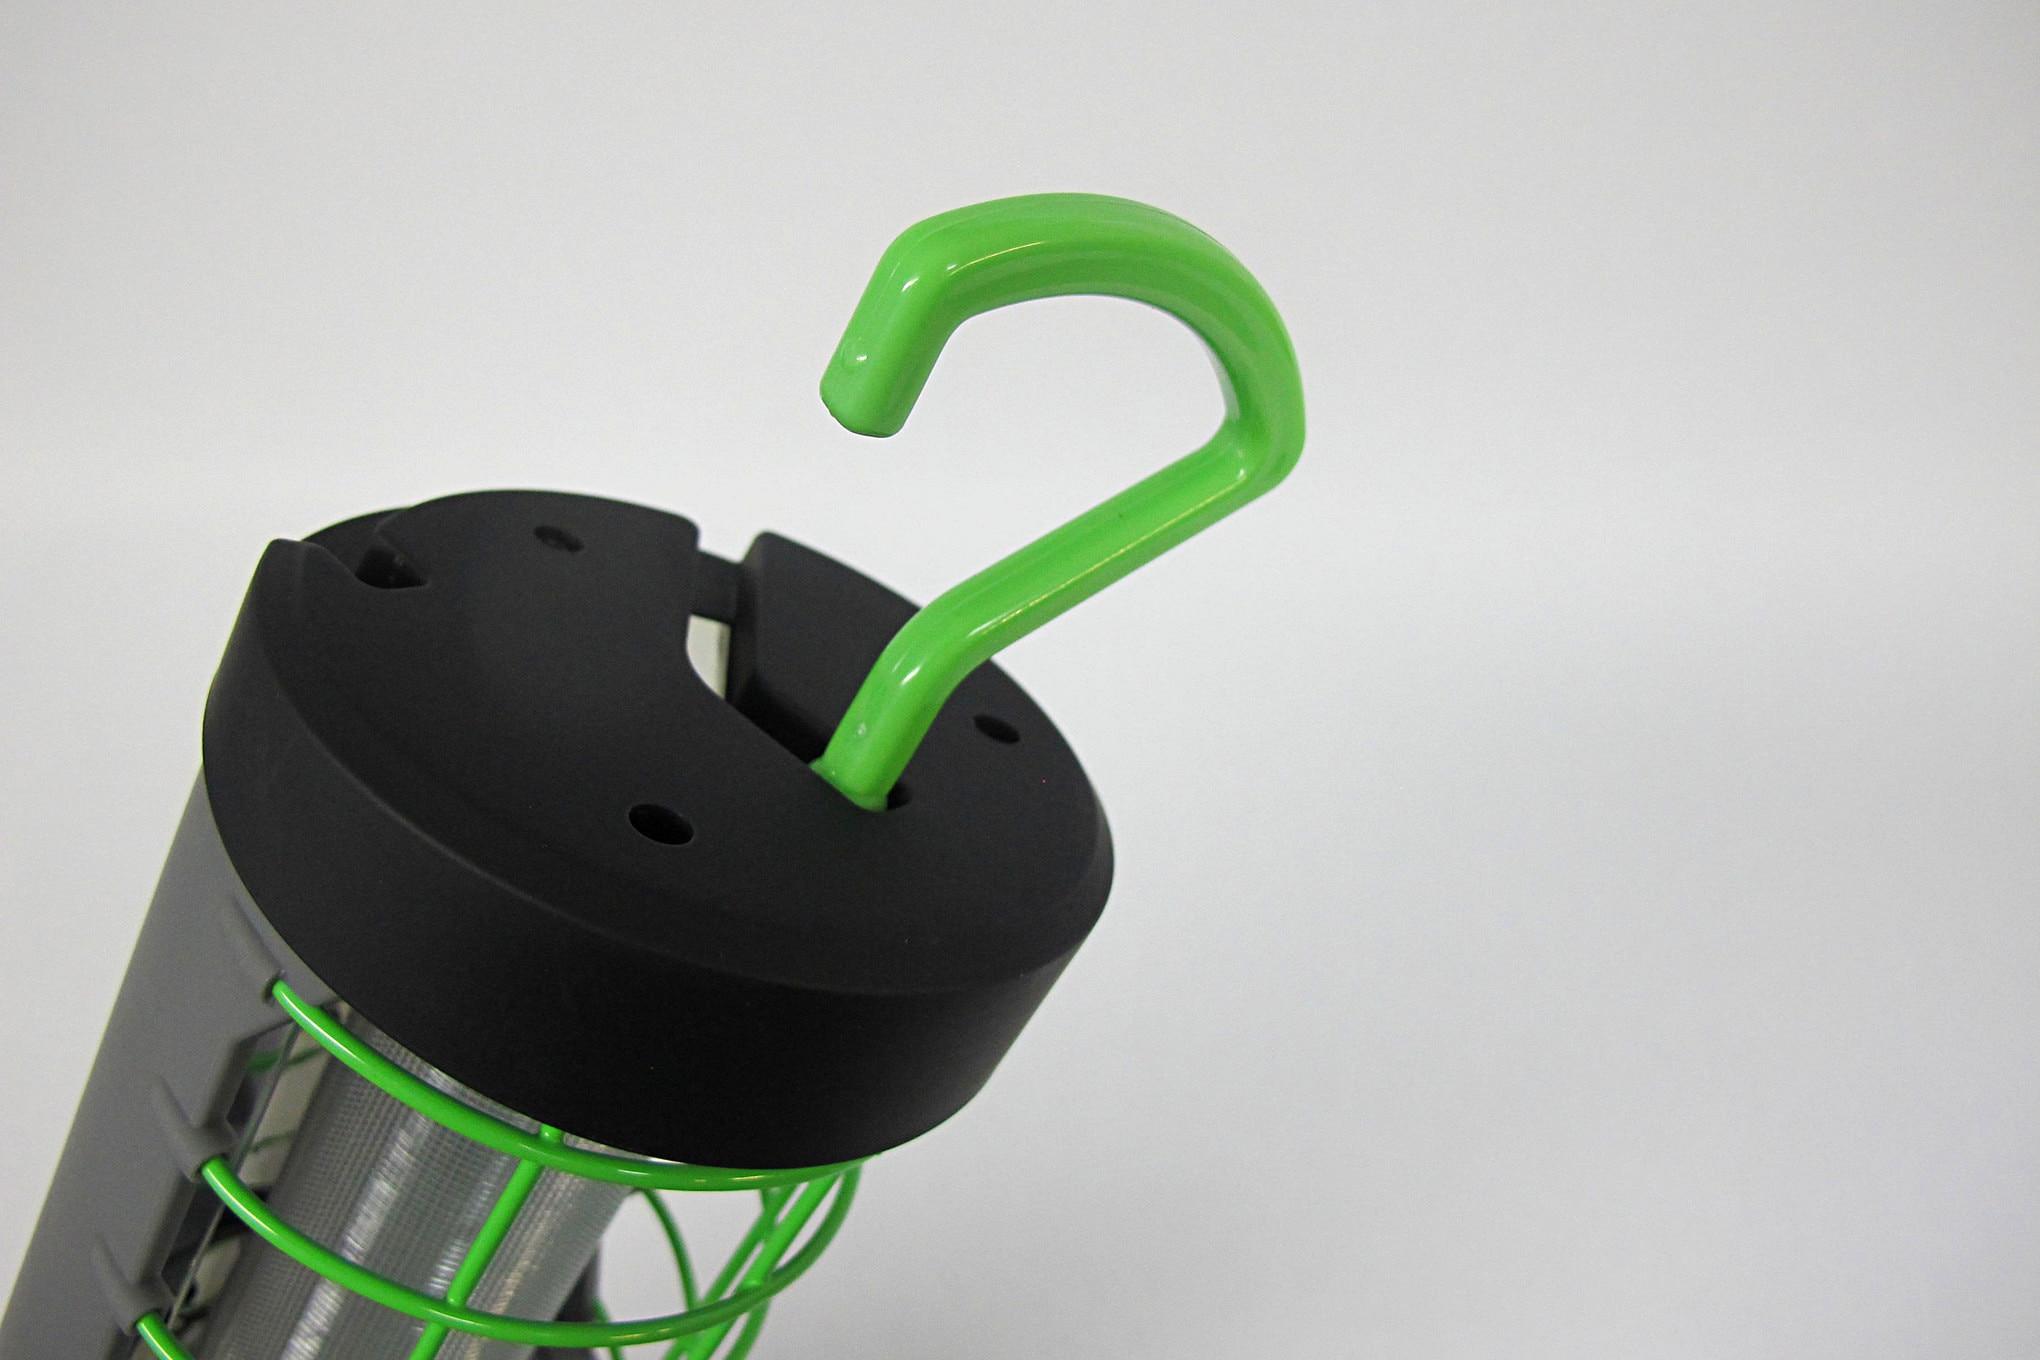 03 Mychanic MEK Light Swivel Hook